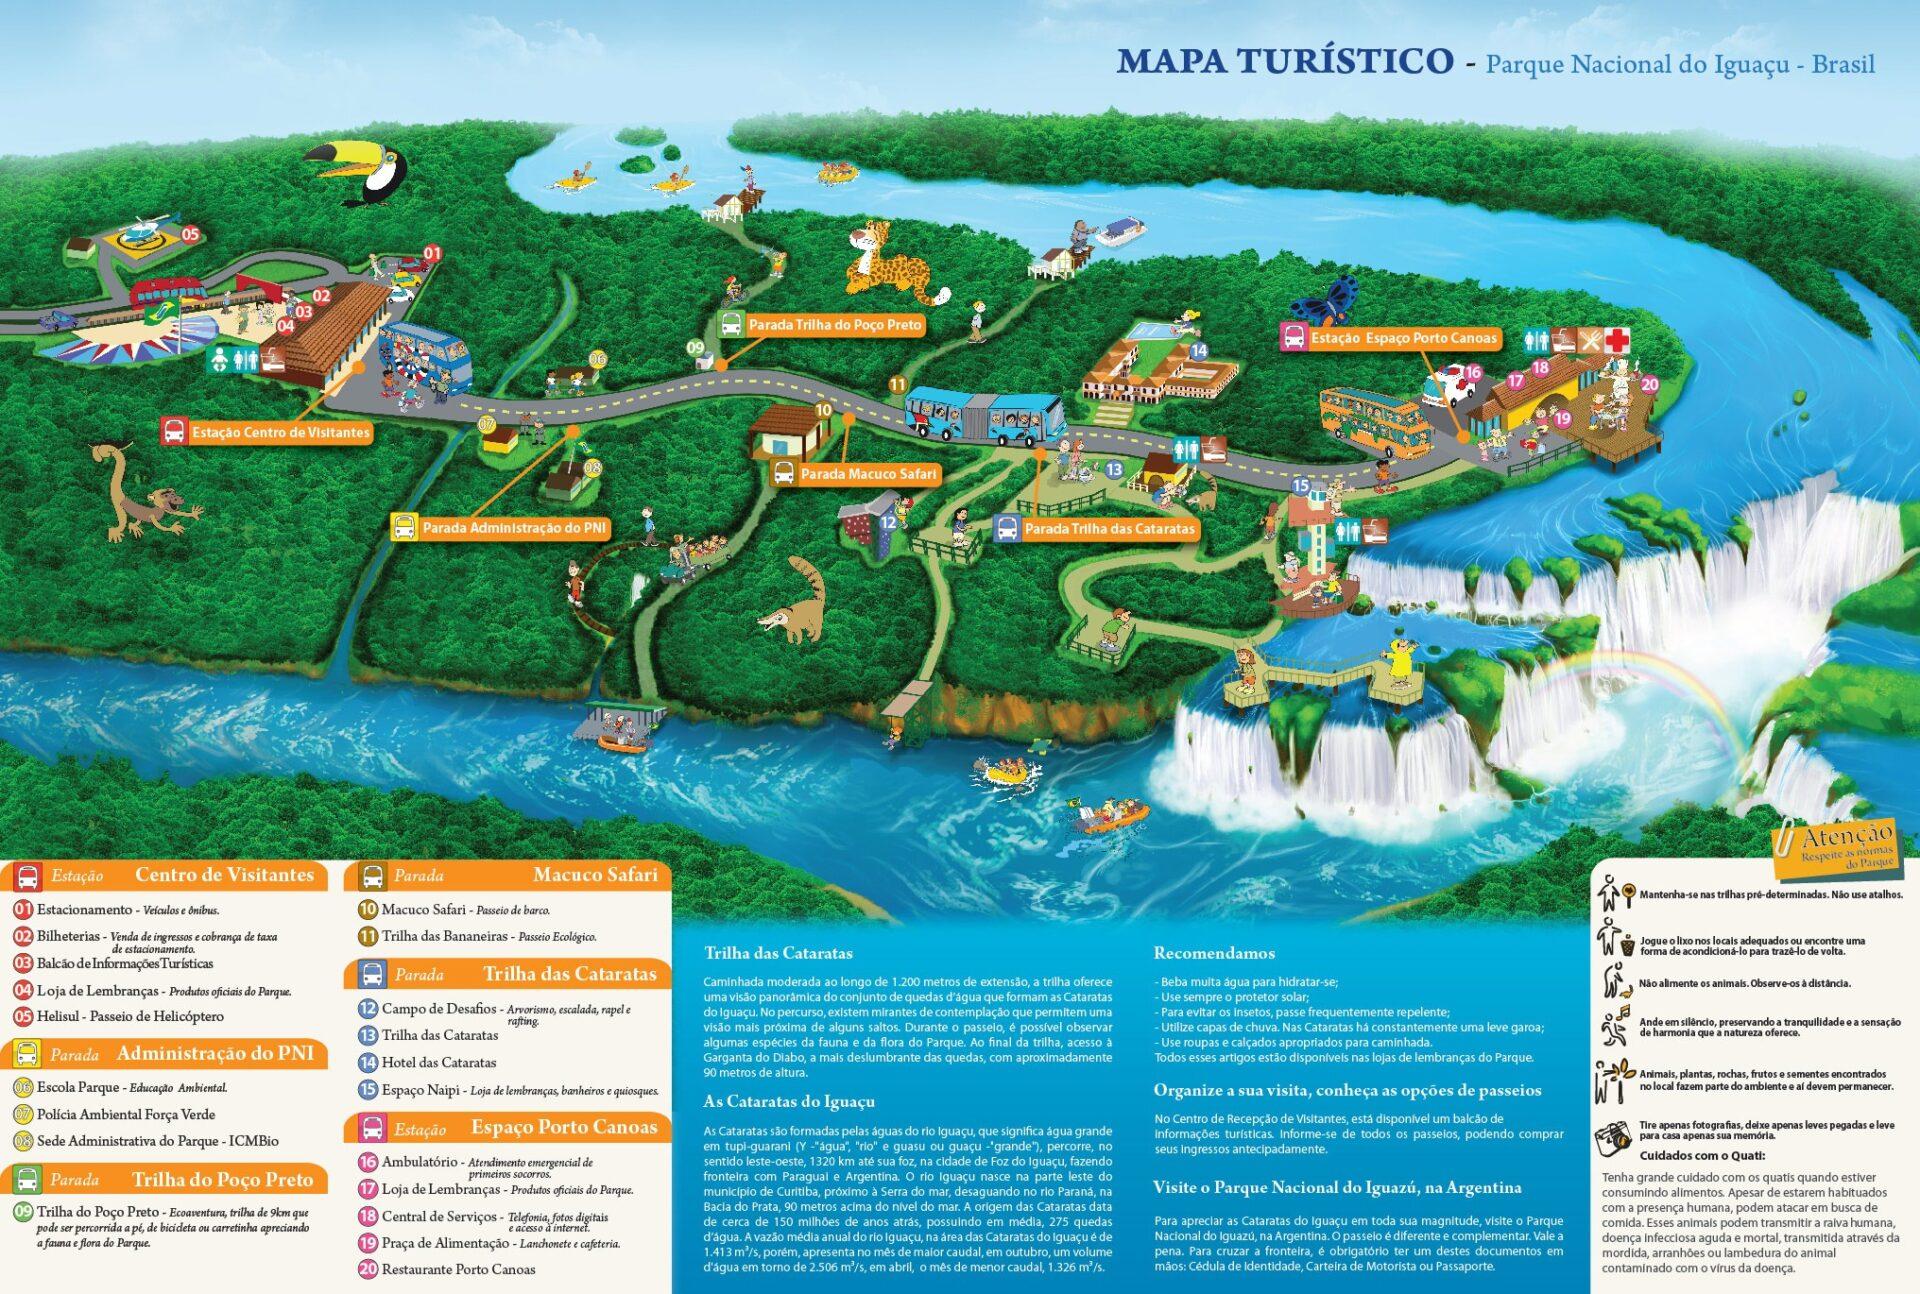 mapa cataratas do iguaçu brasil